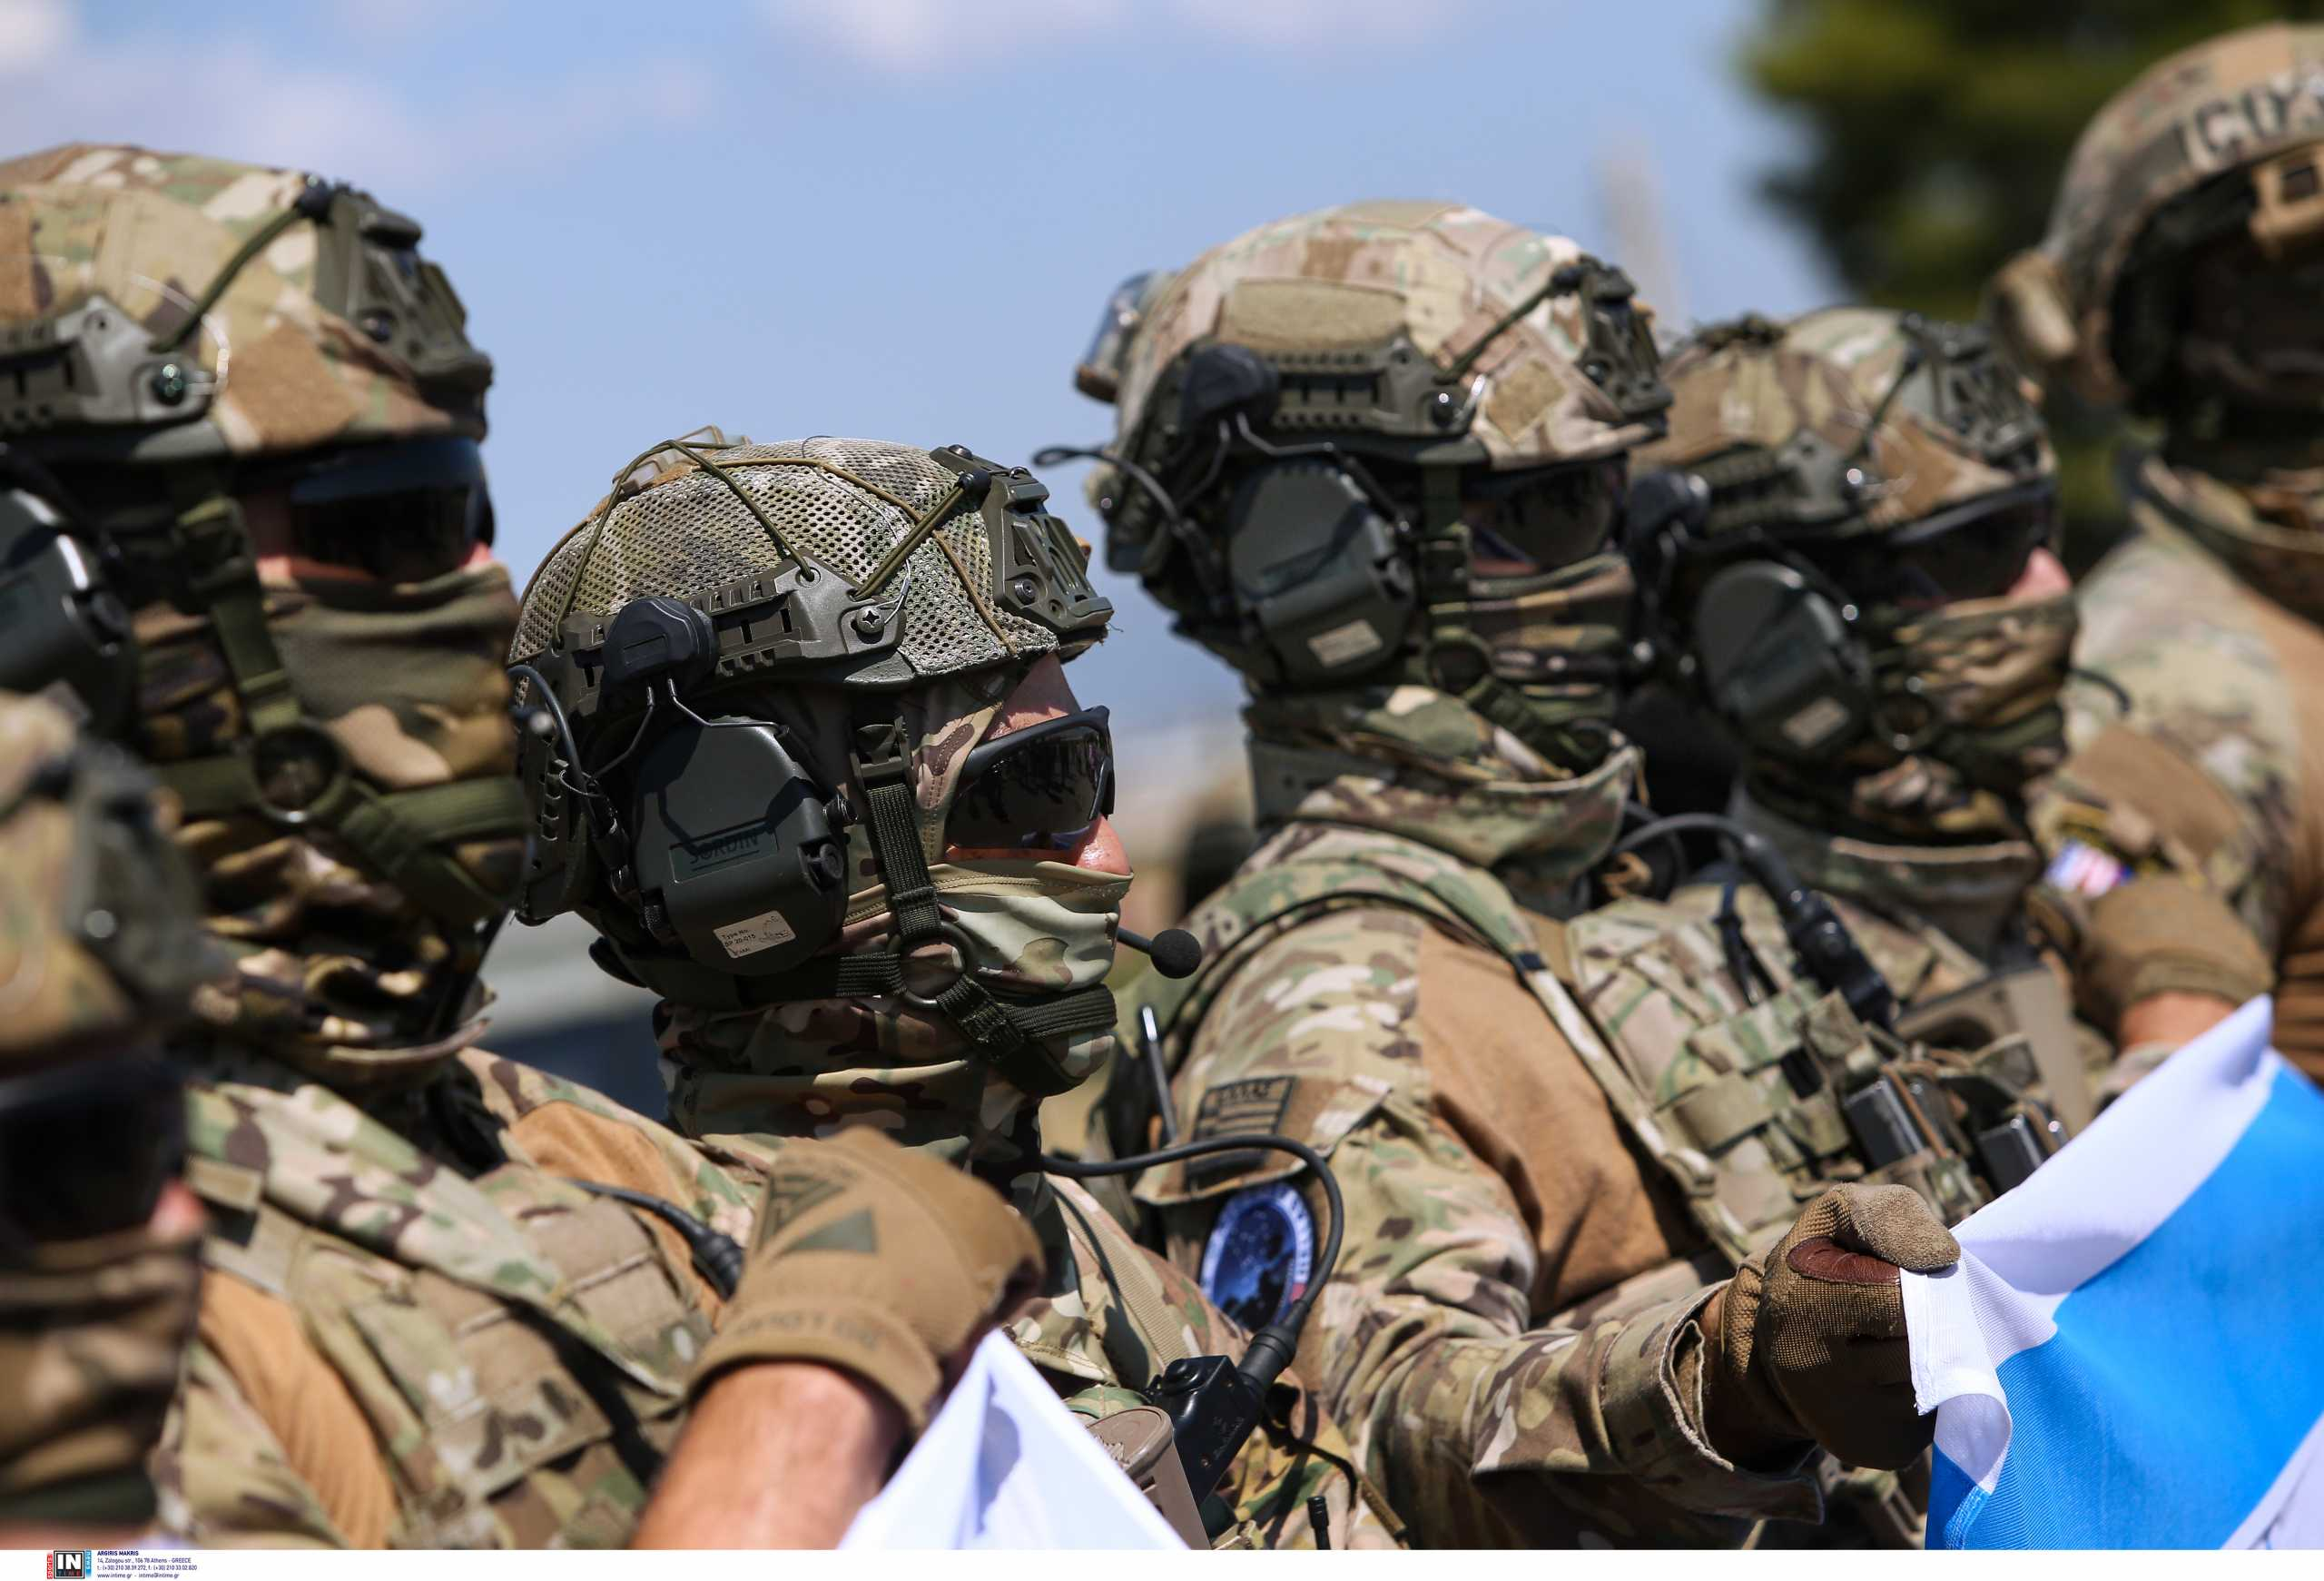 PESCO: Η Ελλάδα είναι από τις πιο δραστήριες ευρωπαϊκές χώρες σε αμυντικές δραστηριότητες